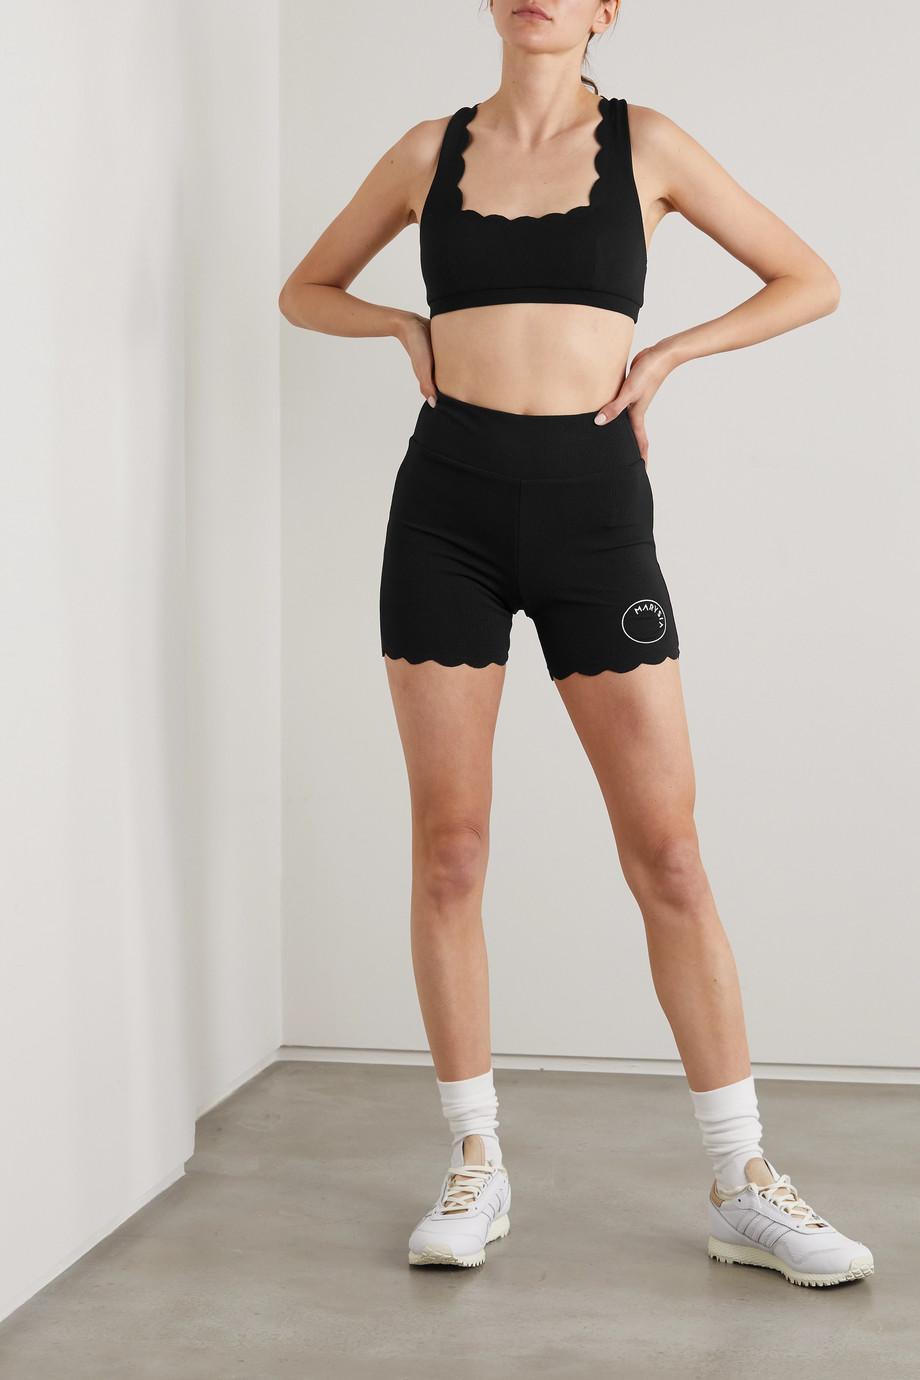 Marysia + NET SUSTAIN Serena scalloped stretch recycled-seersucker sports bra